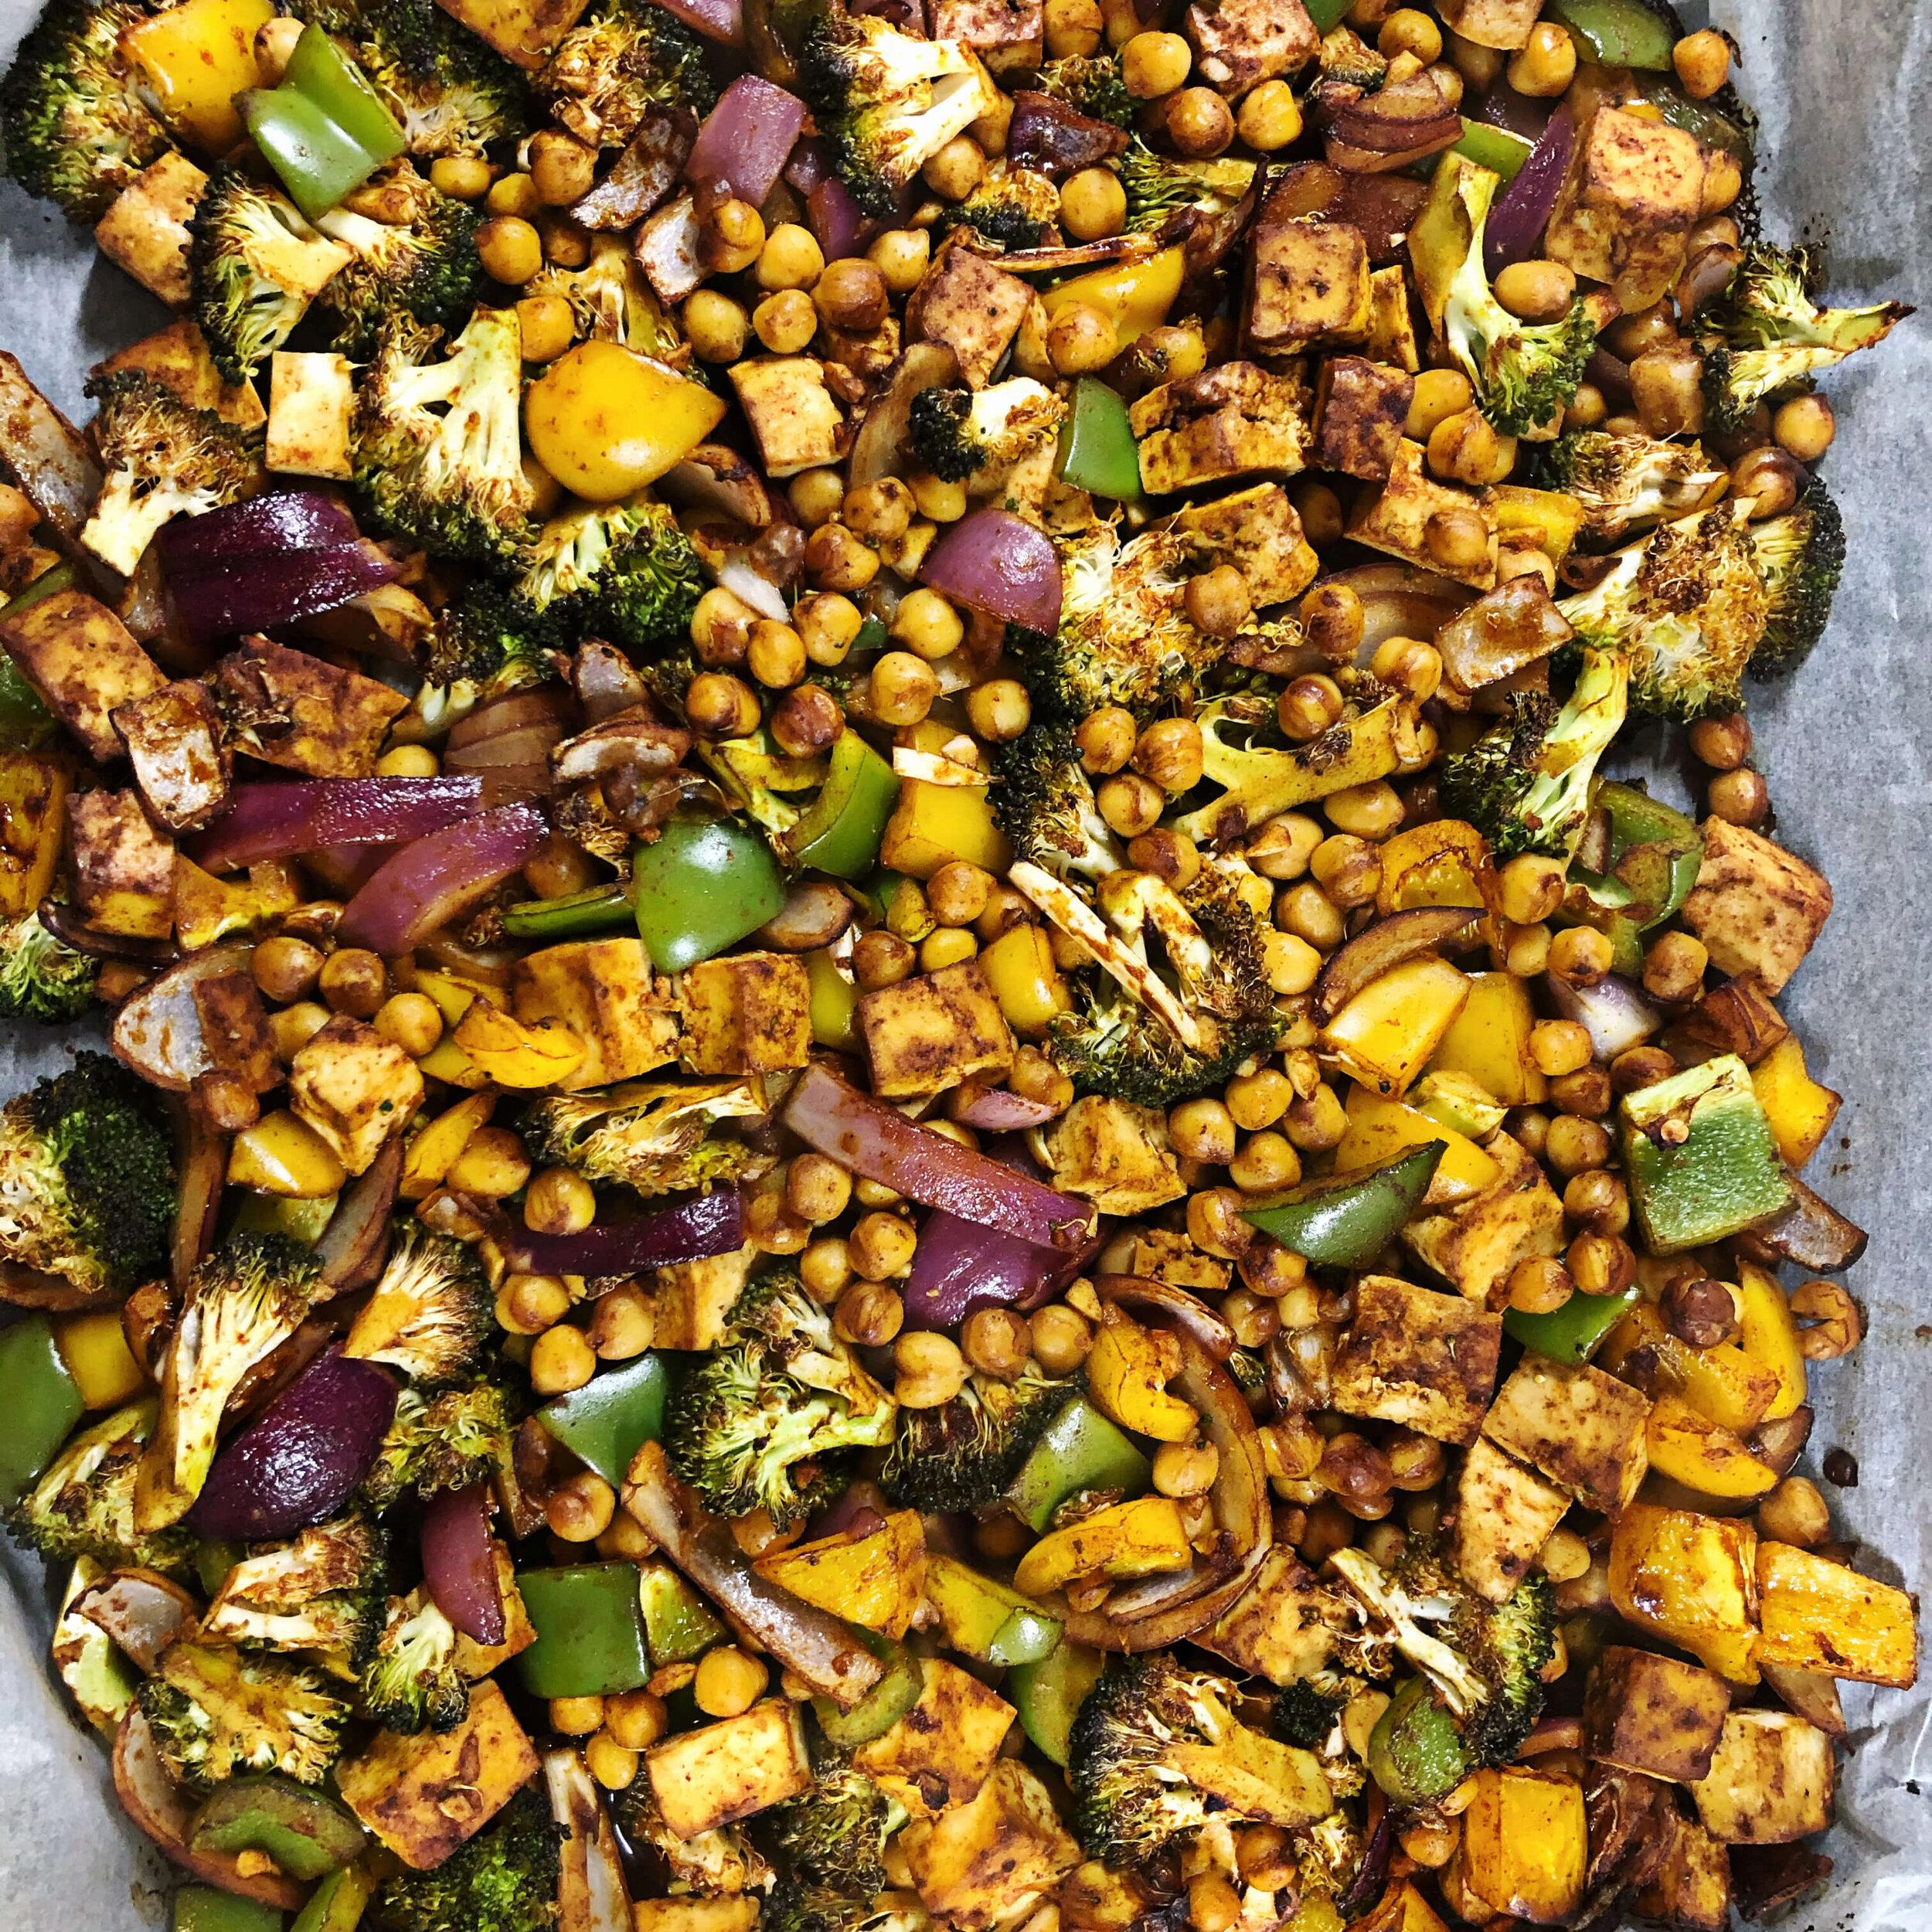 Healthy Organic Roasted Tofu Veggies and Chickpea Wraps